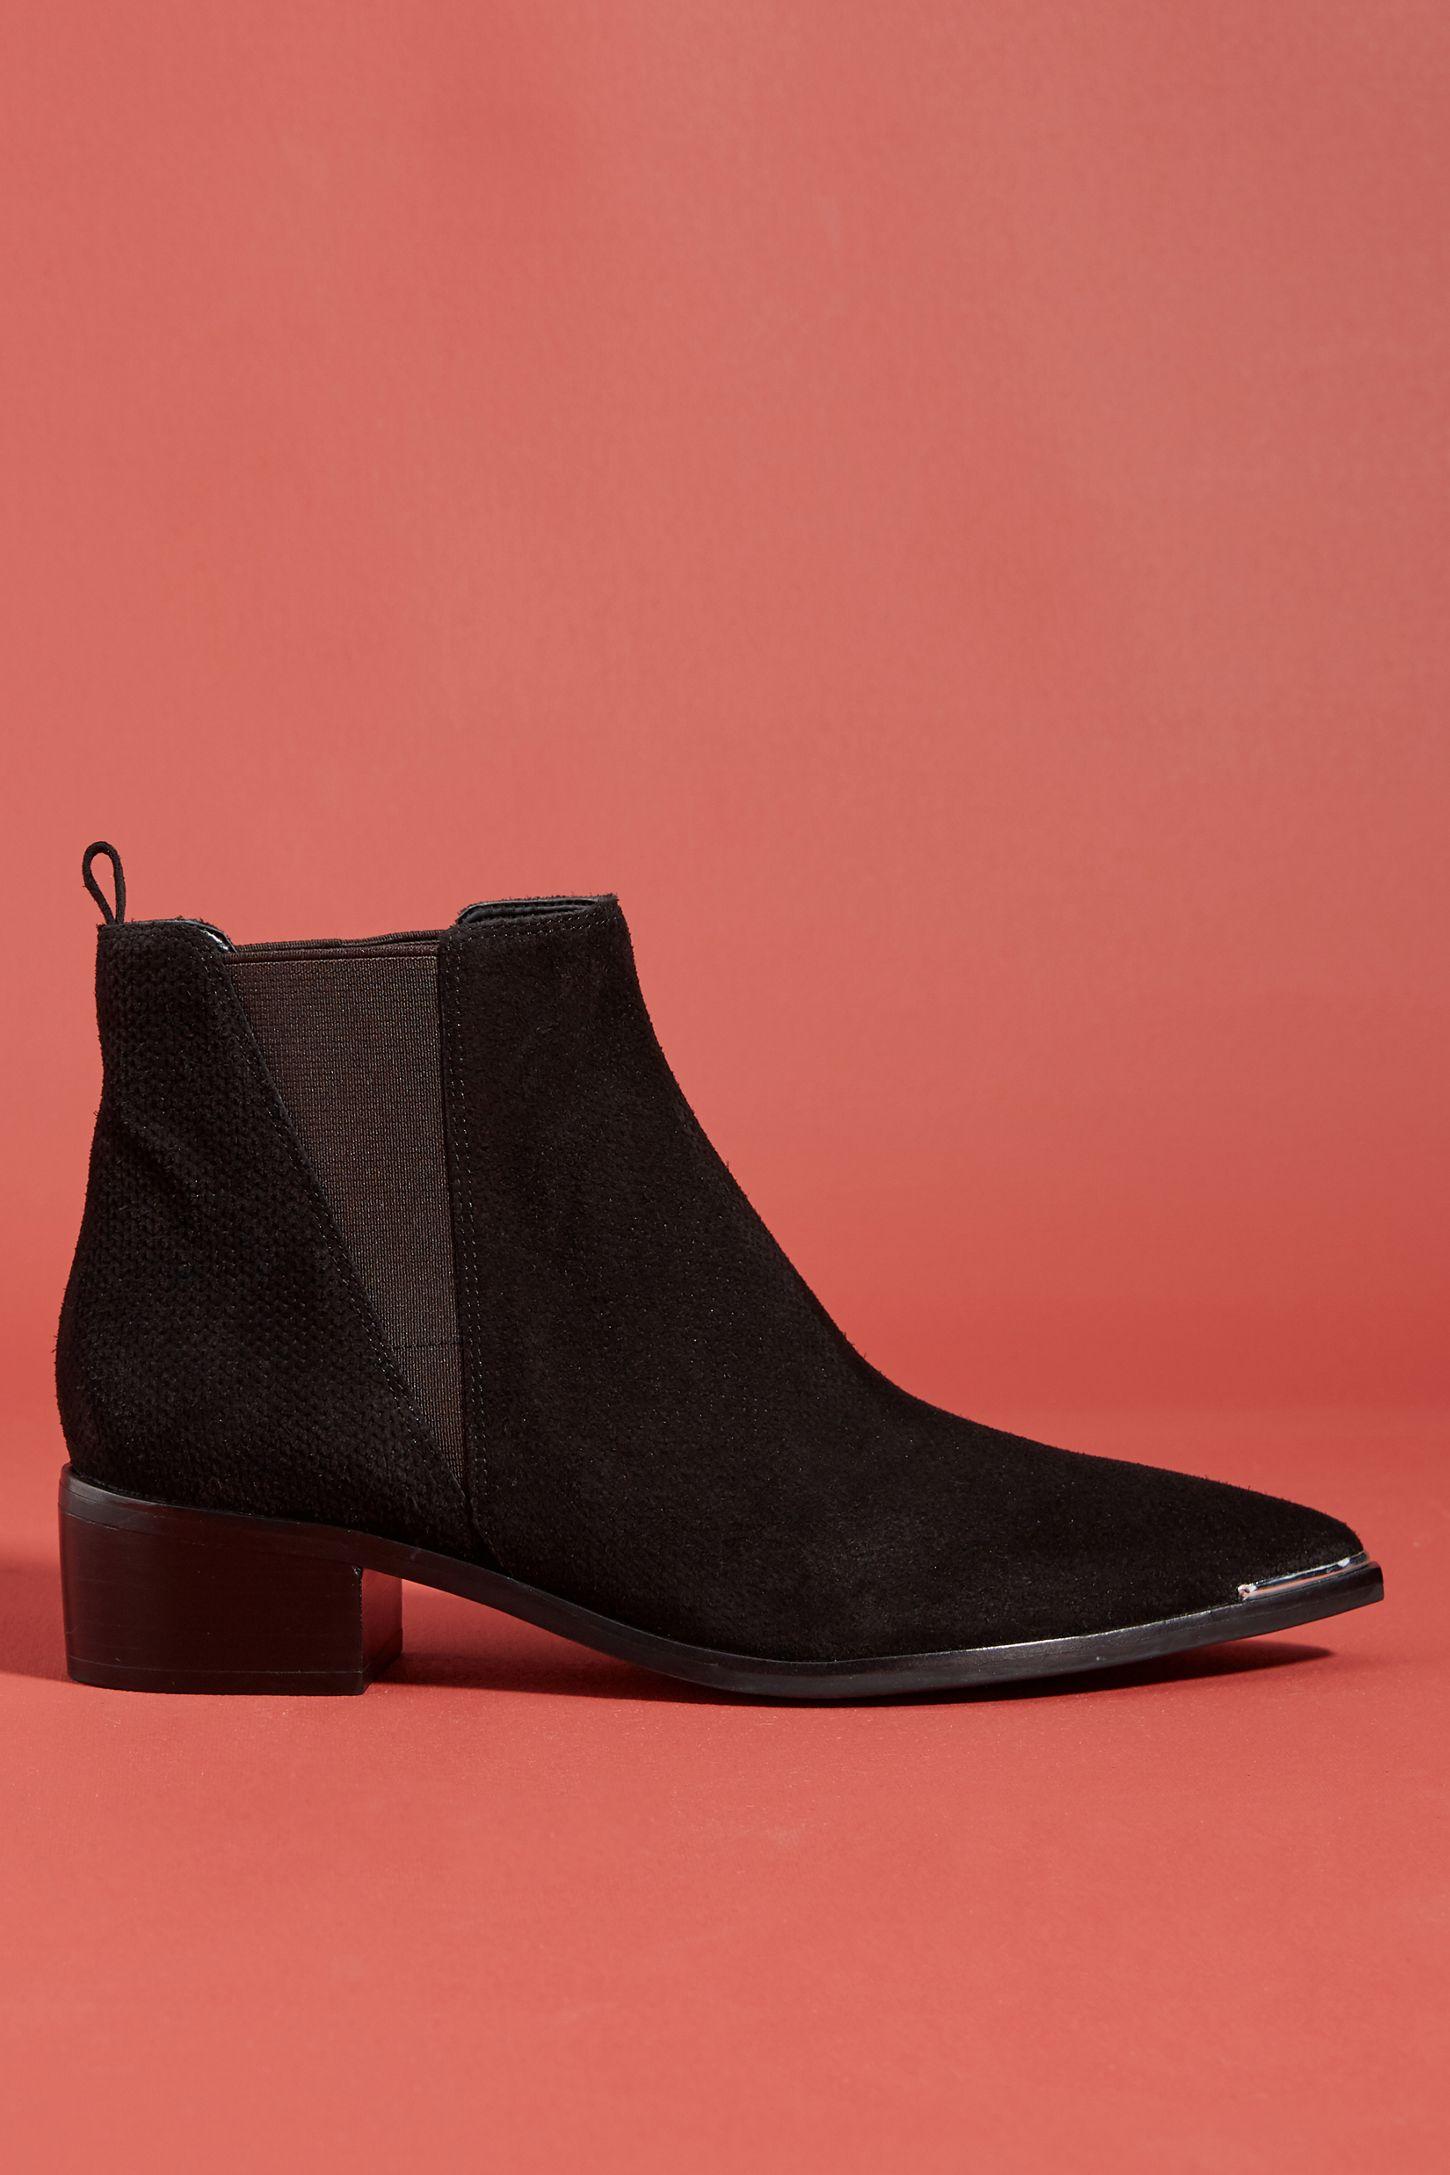 f0425f7c0bc08 Marc Fisher LTD Yalen Boots   Anthropologie